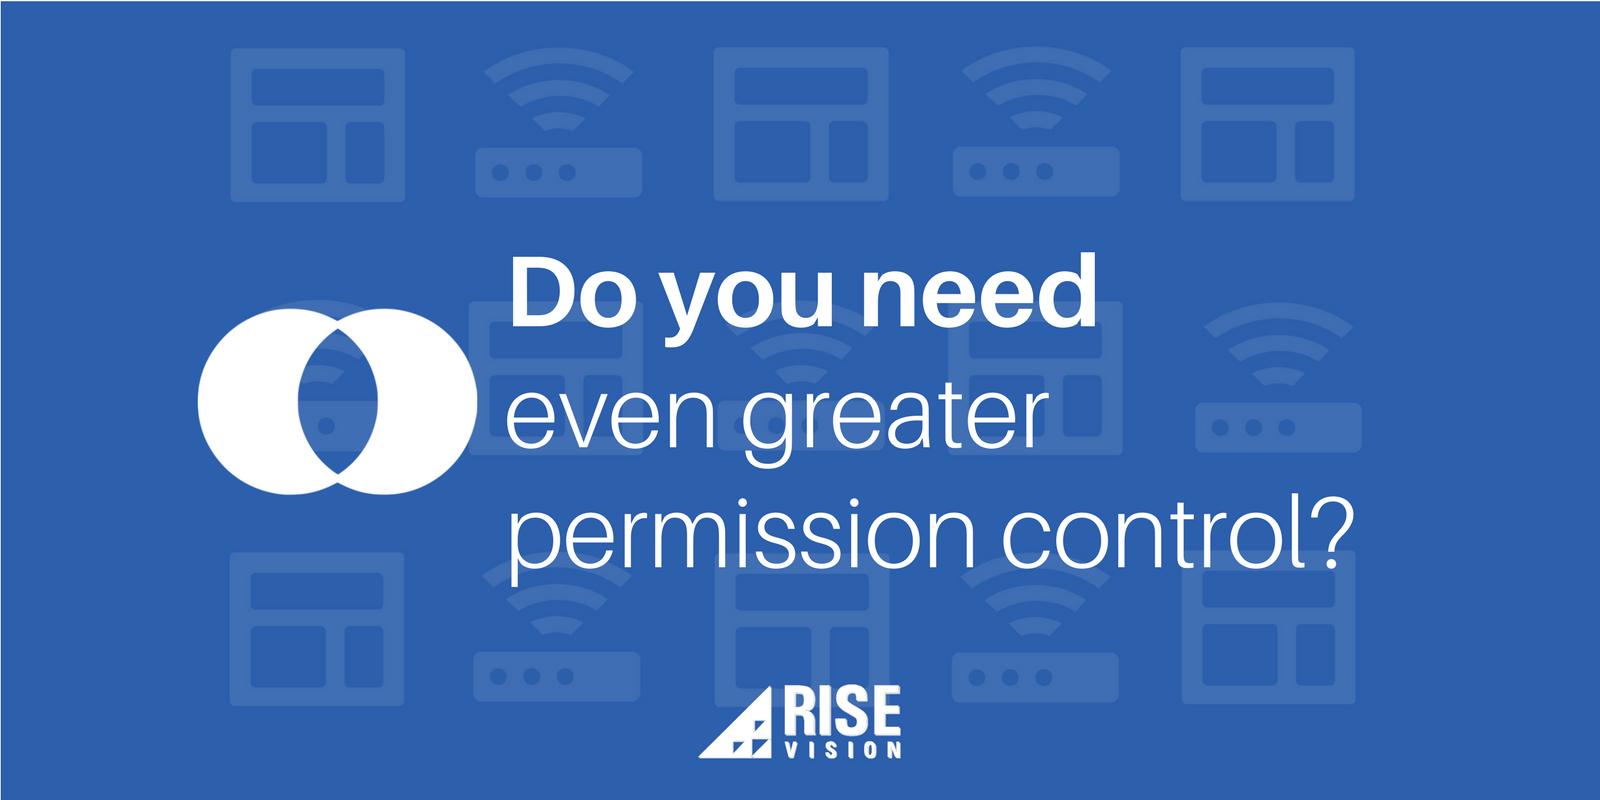 Rise Vision Digital Signage Content Management Permissions User Roles.png